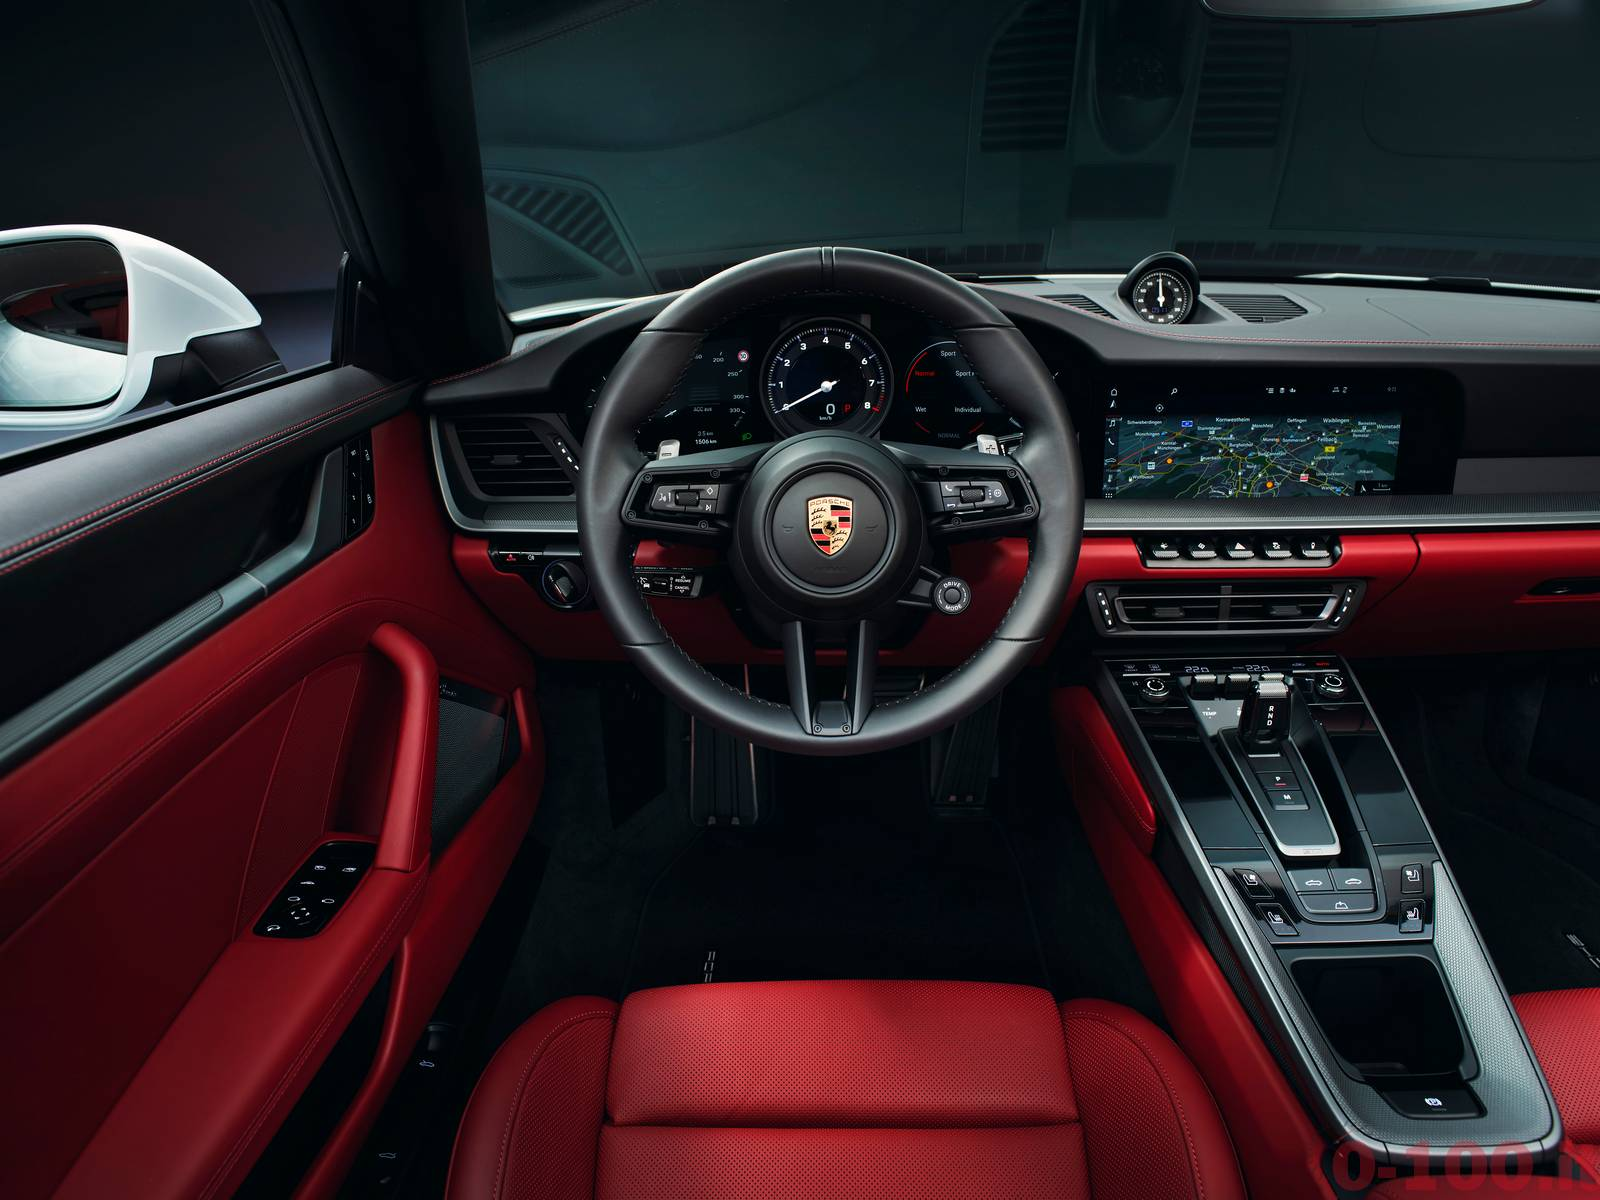 Porsche_992_carrera_coupe_cabriolet_iaa_frankfurt_2019_0-100_10